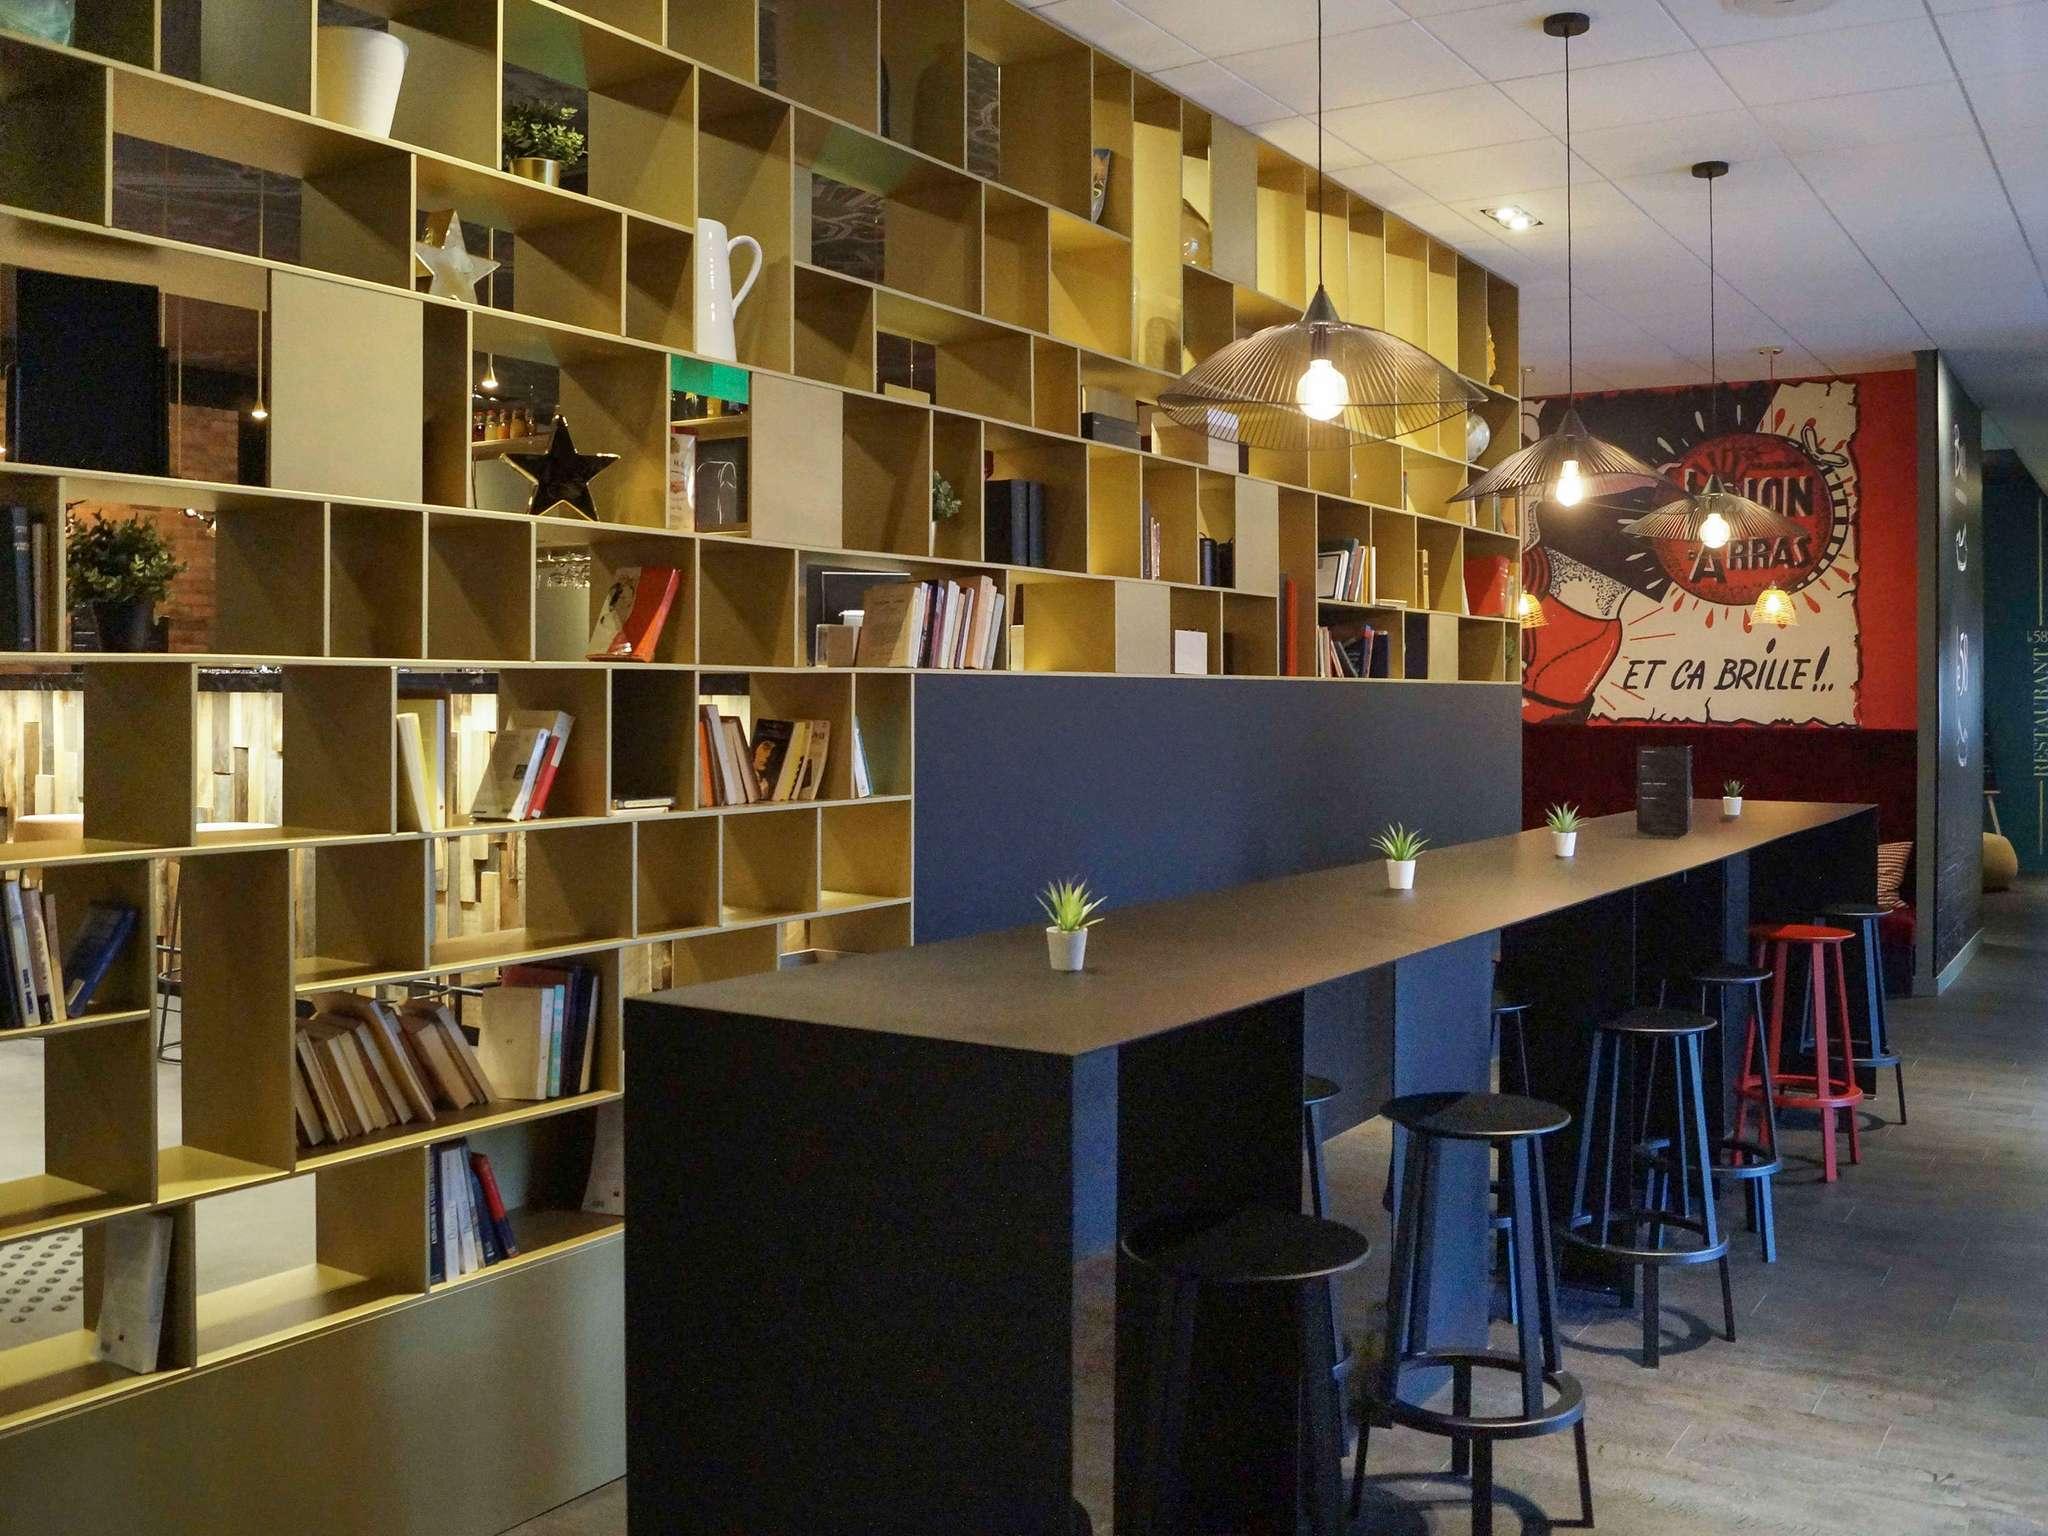 Coaching Deco Pas Cher hotel in arras - mercure arras centre gare hotel